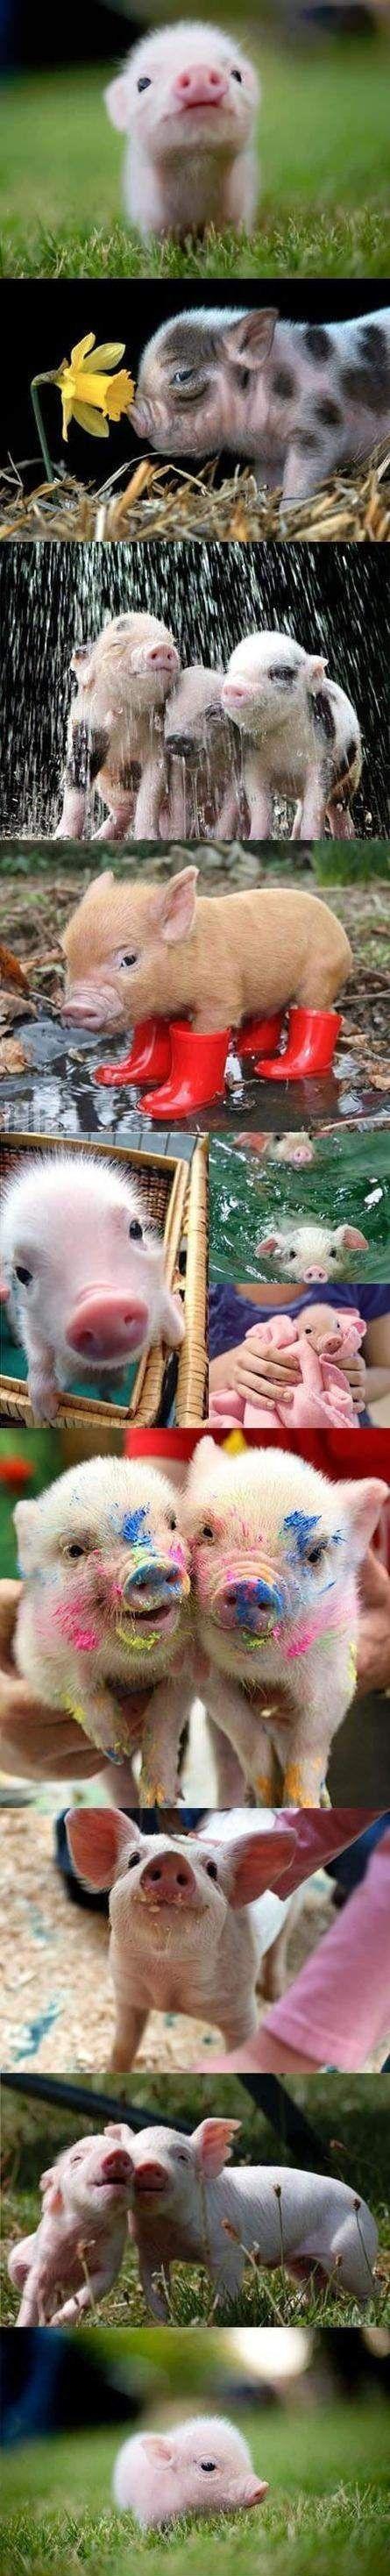 cute pigs shared by http://www.veggiefocus.com